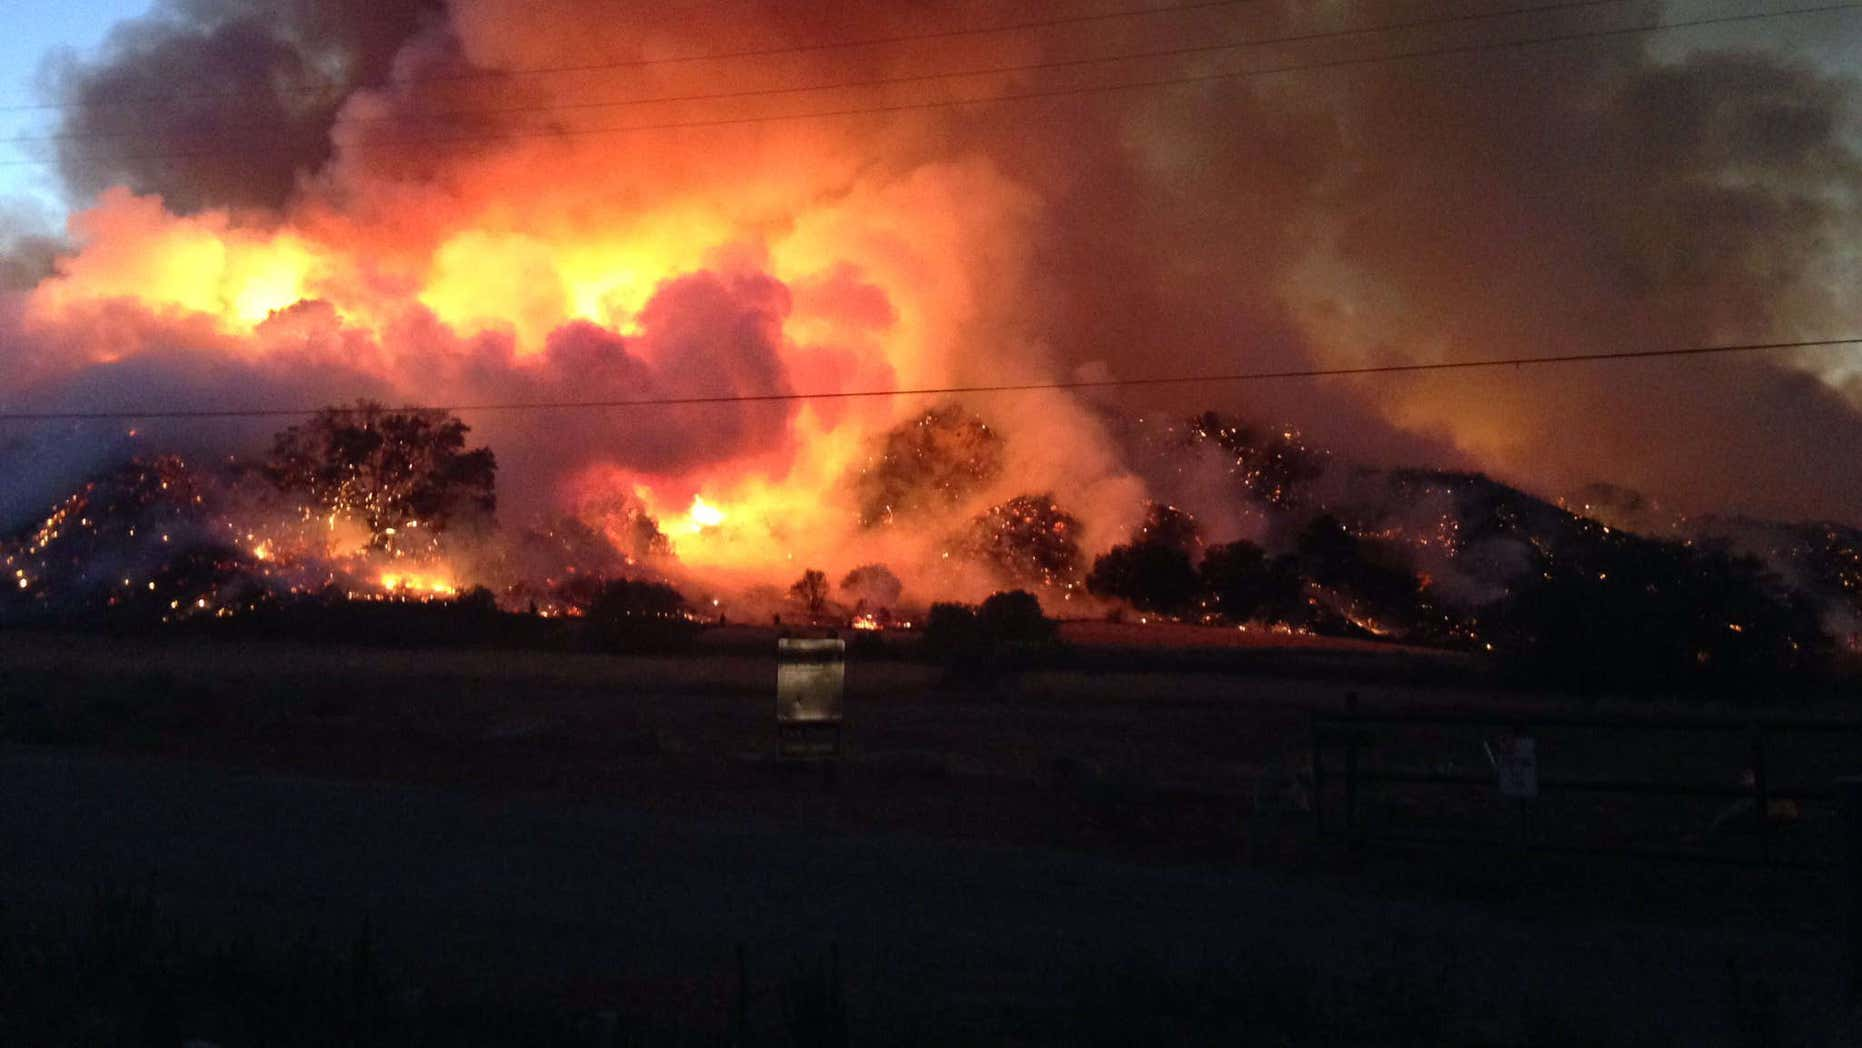 July 9, 2016: Sage fire burns in Santa Clarita, Calif.